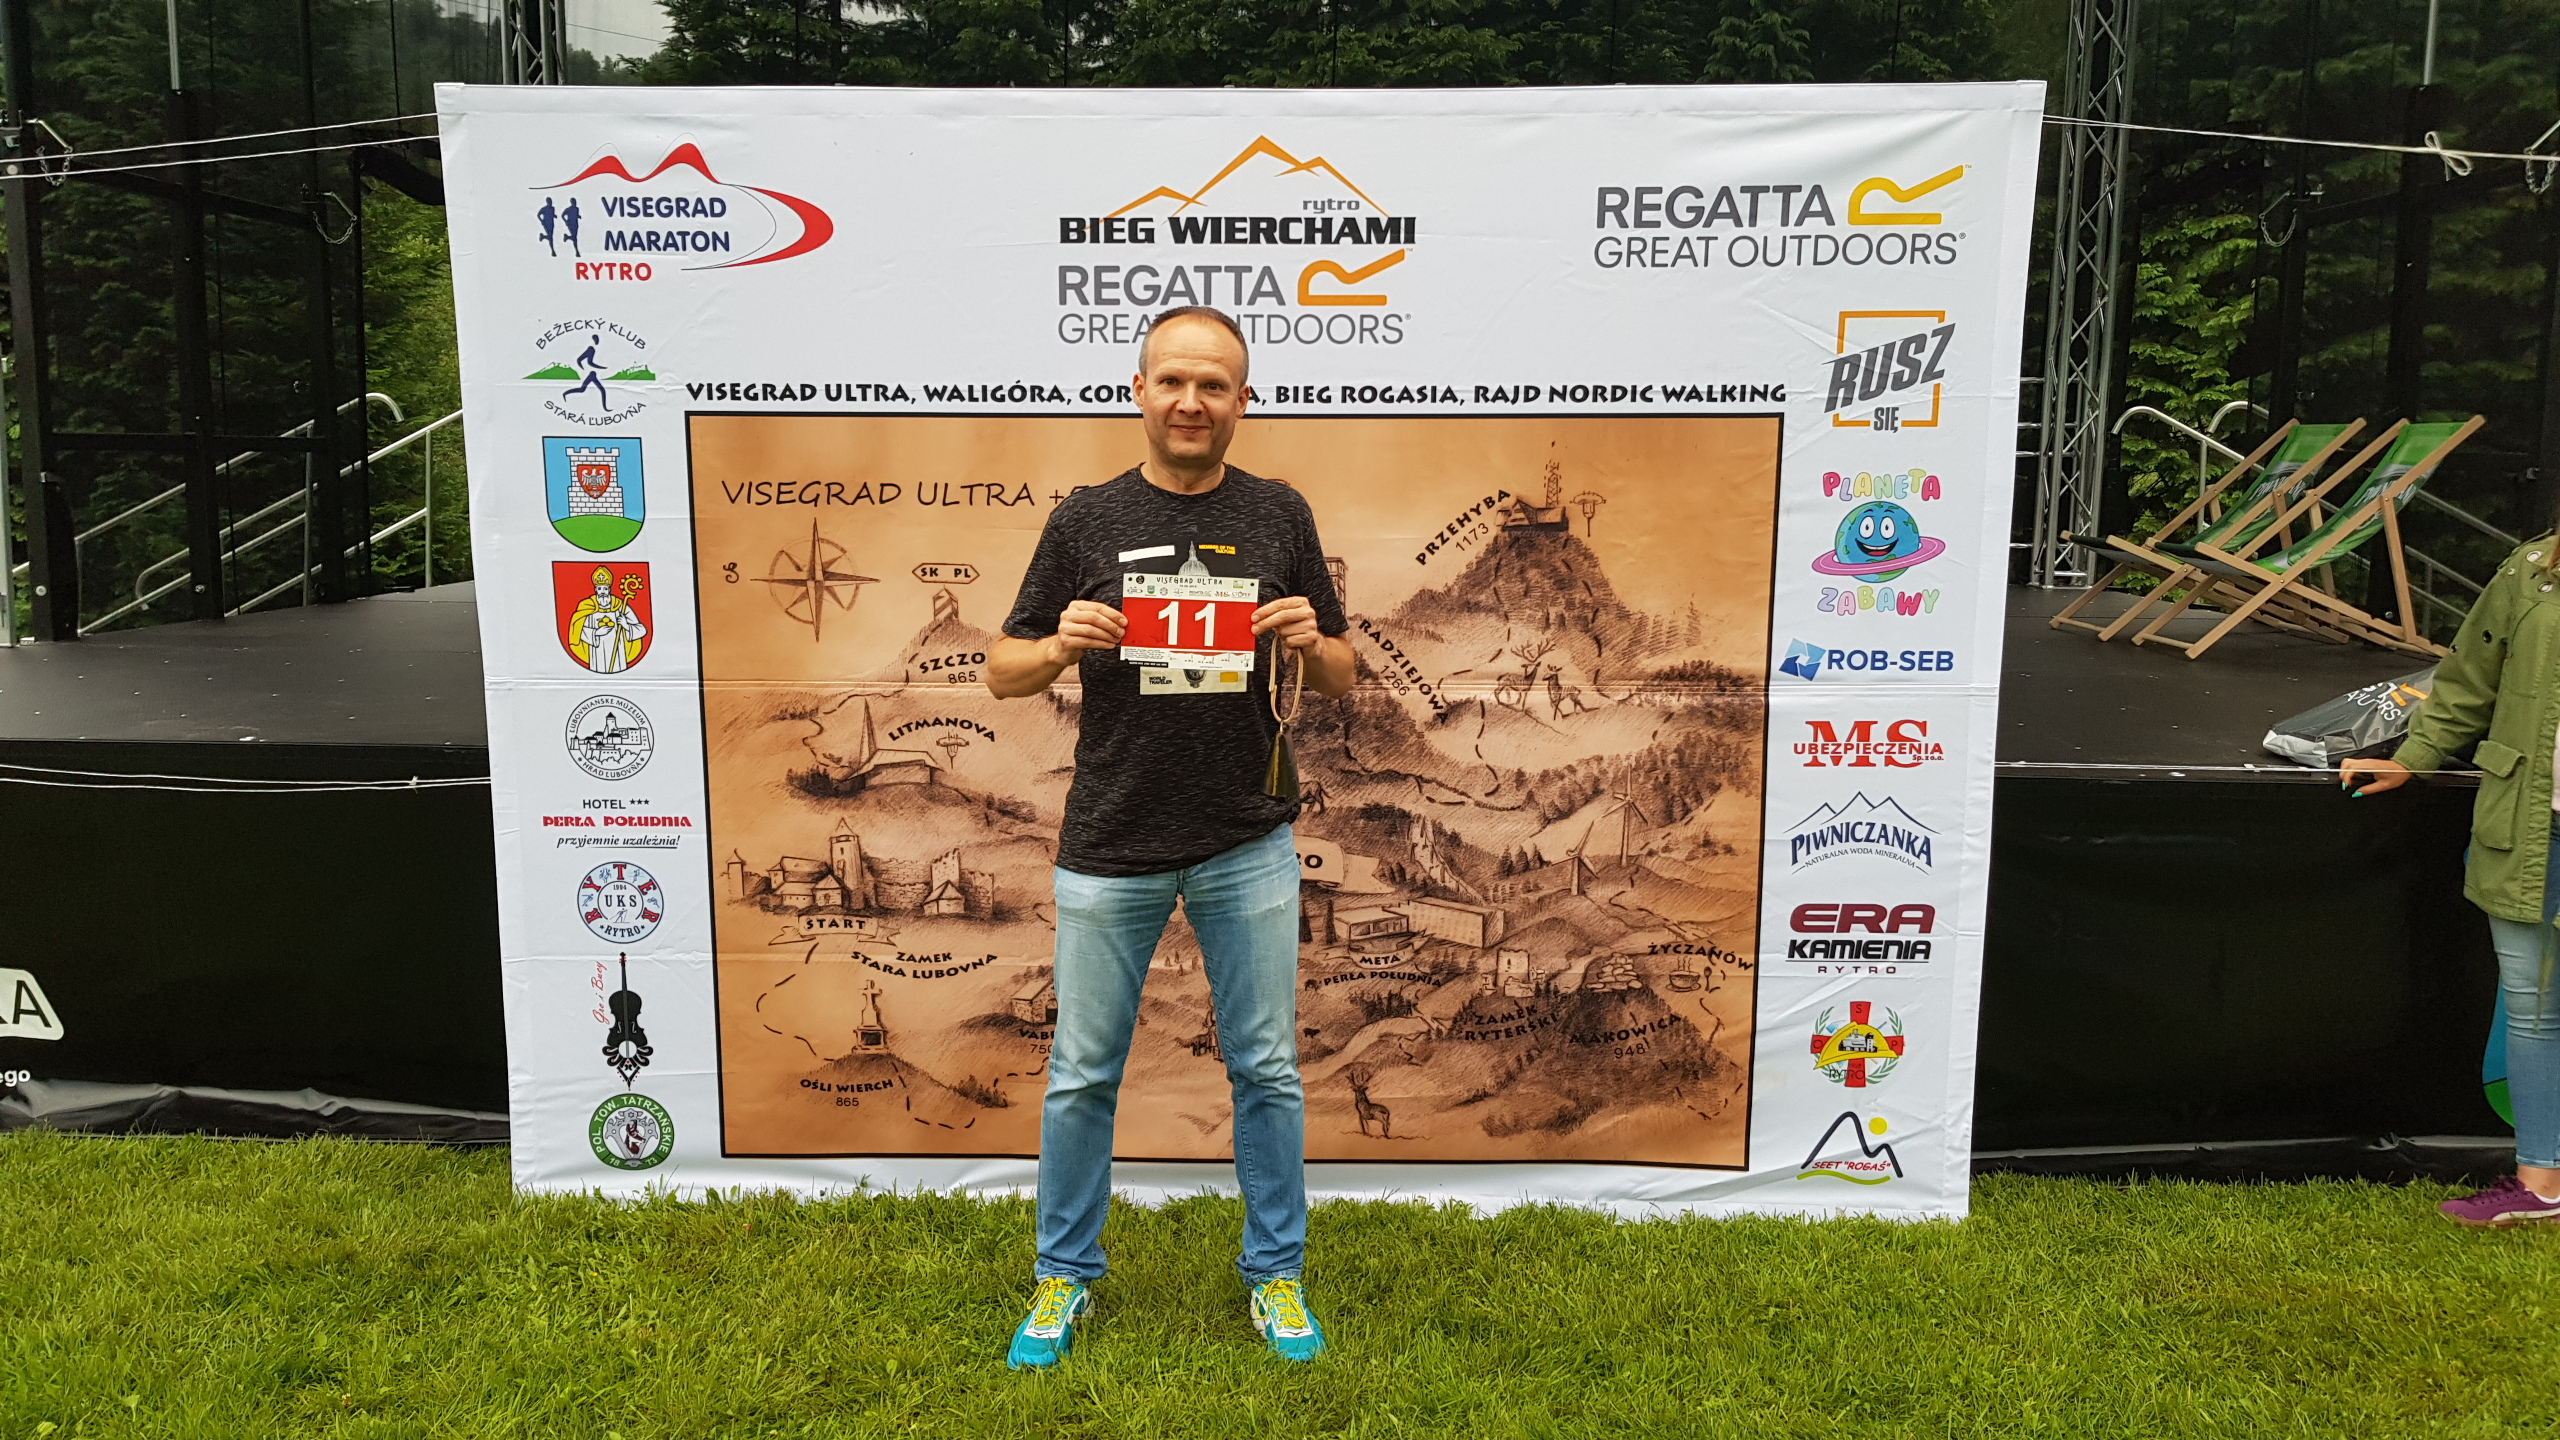 Tomasz Visegrad Ultra i jego numer startowy